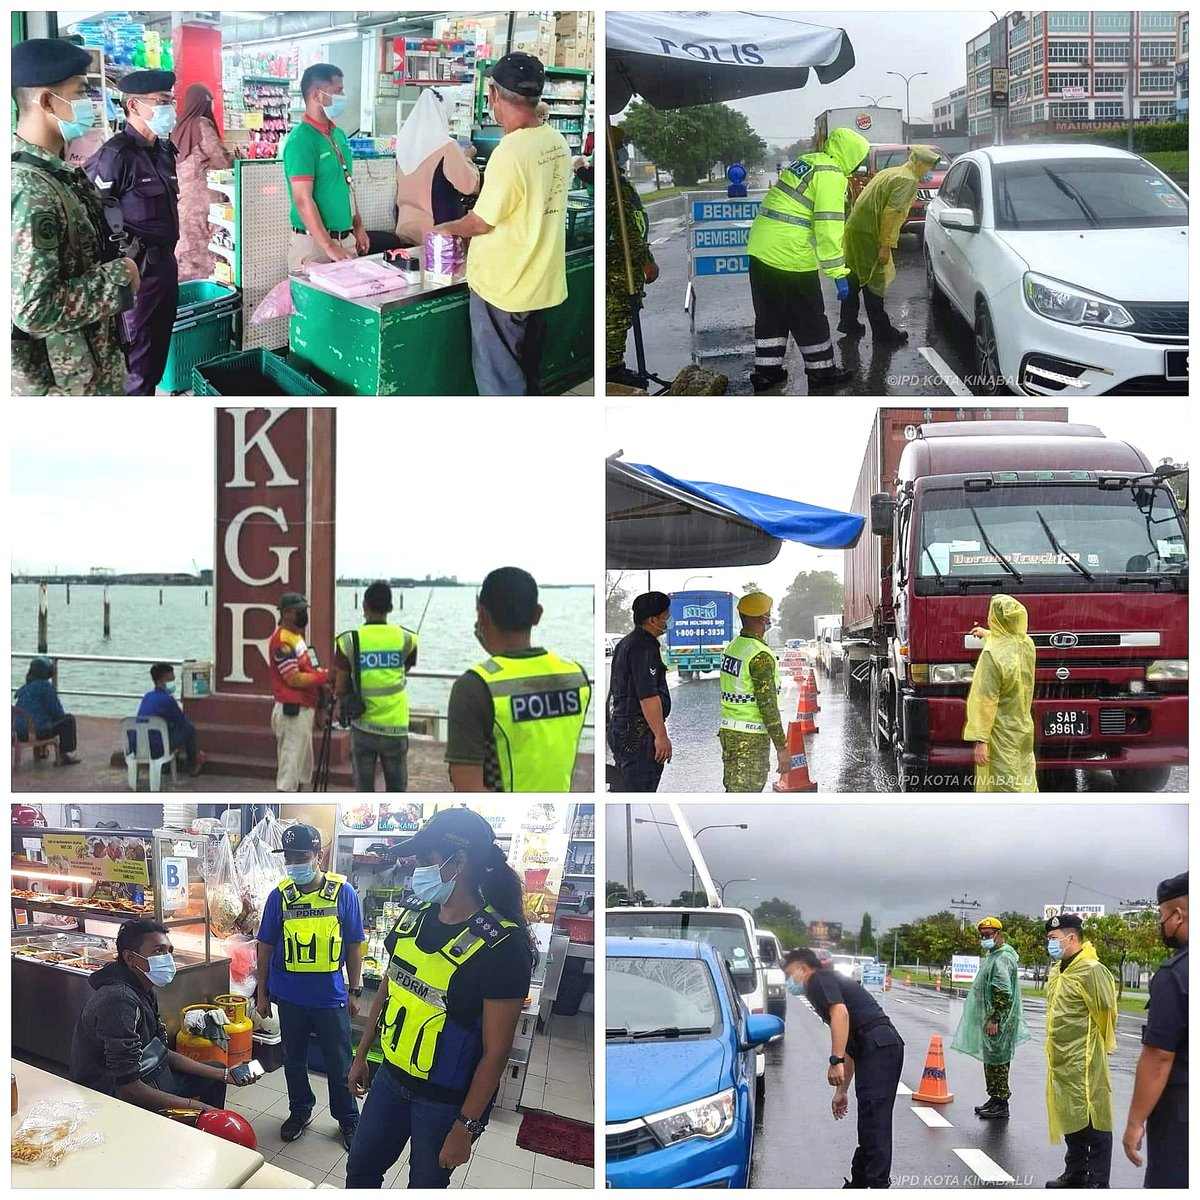 RT PDRMsia: #PKPB #COVID-19  PIC OF THE DAY: PEMANTAUAN PEMATUHAN SOP PKPB OLEH PDRM   Sumber: Polis Klang Selatan, Polis Selangor dan Polis Daerah Kota Kinabalu  #StayHome #BeSafe #Pray4Malaysia HELP BREAK THE COVID-19 CHAIN https://t.co/cEBoiLIWFv